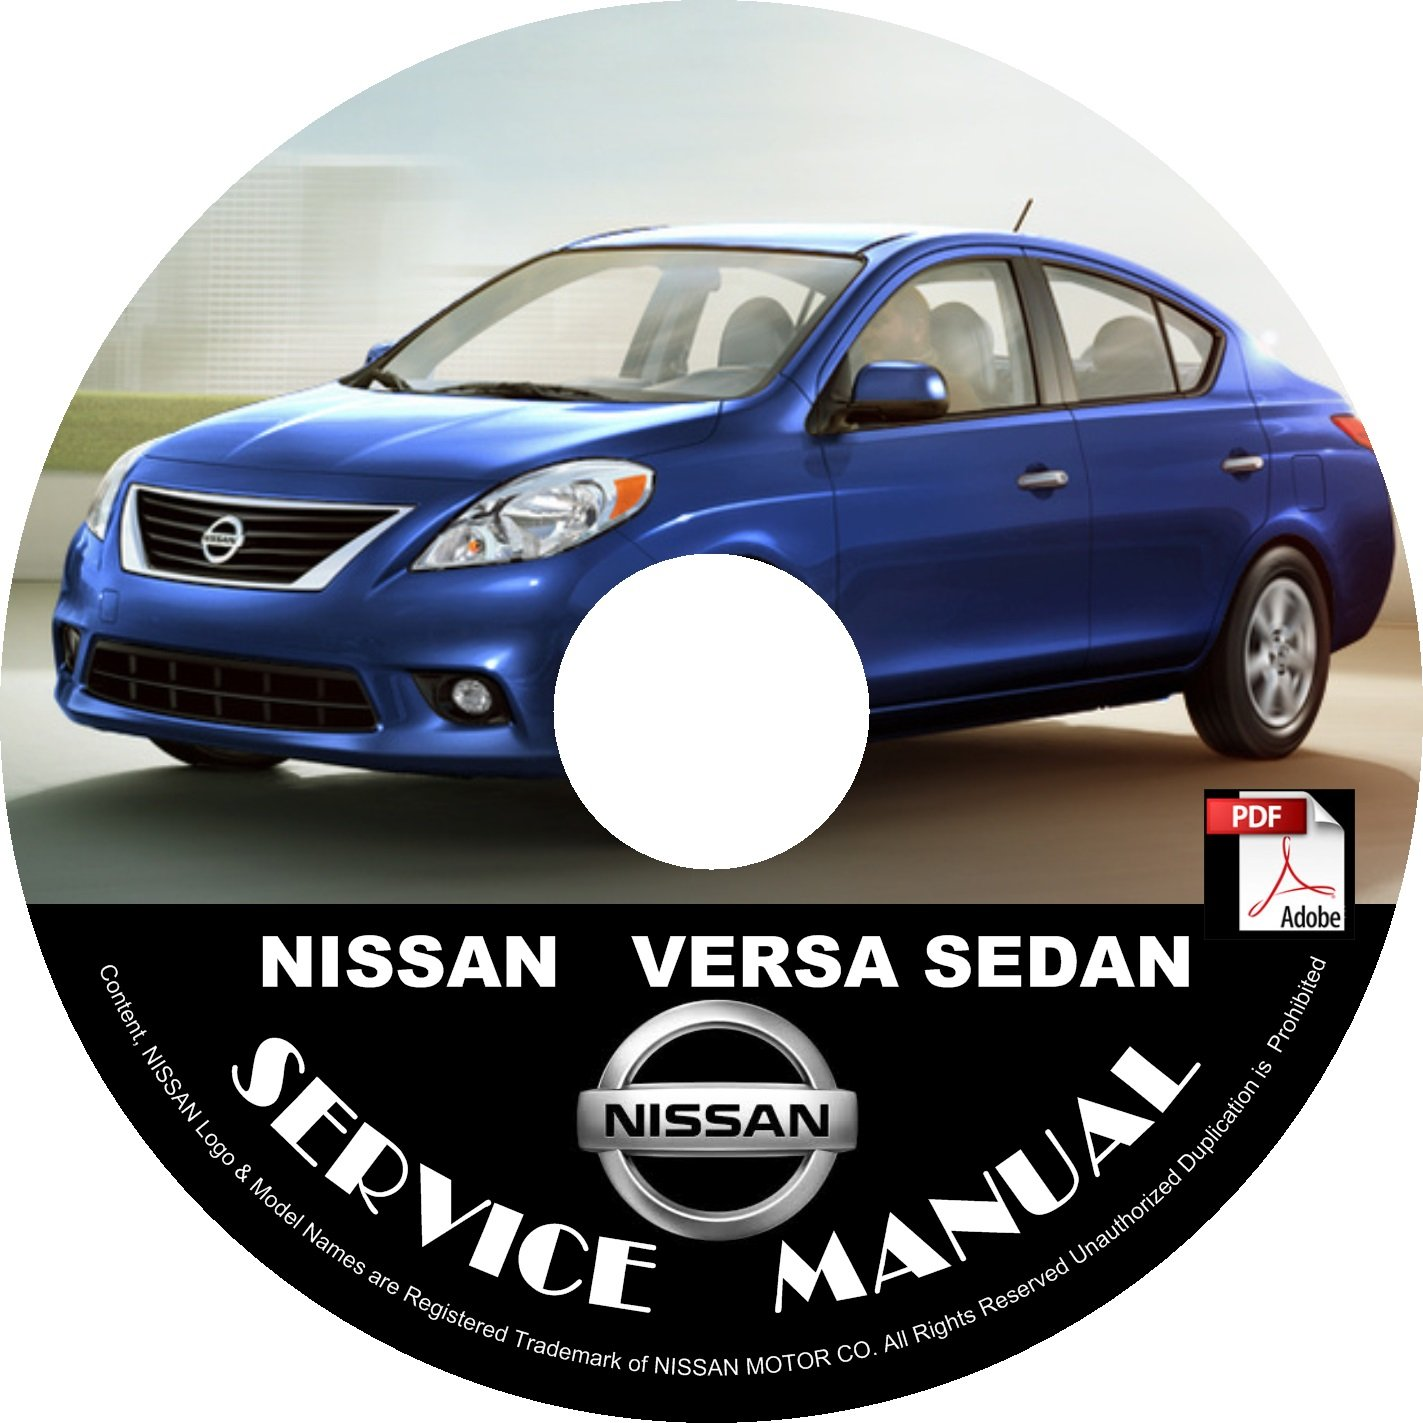 2014 nissan versa sedan owners manual